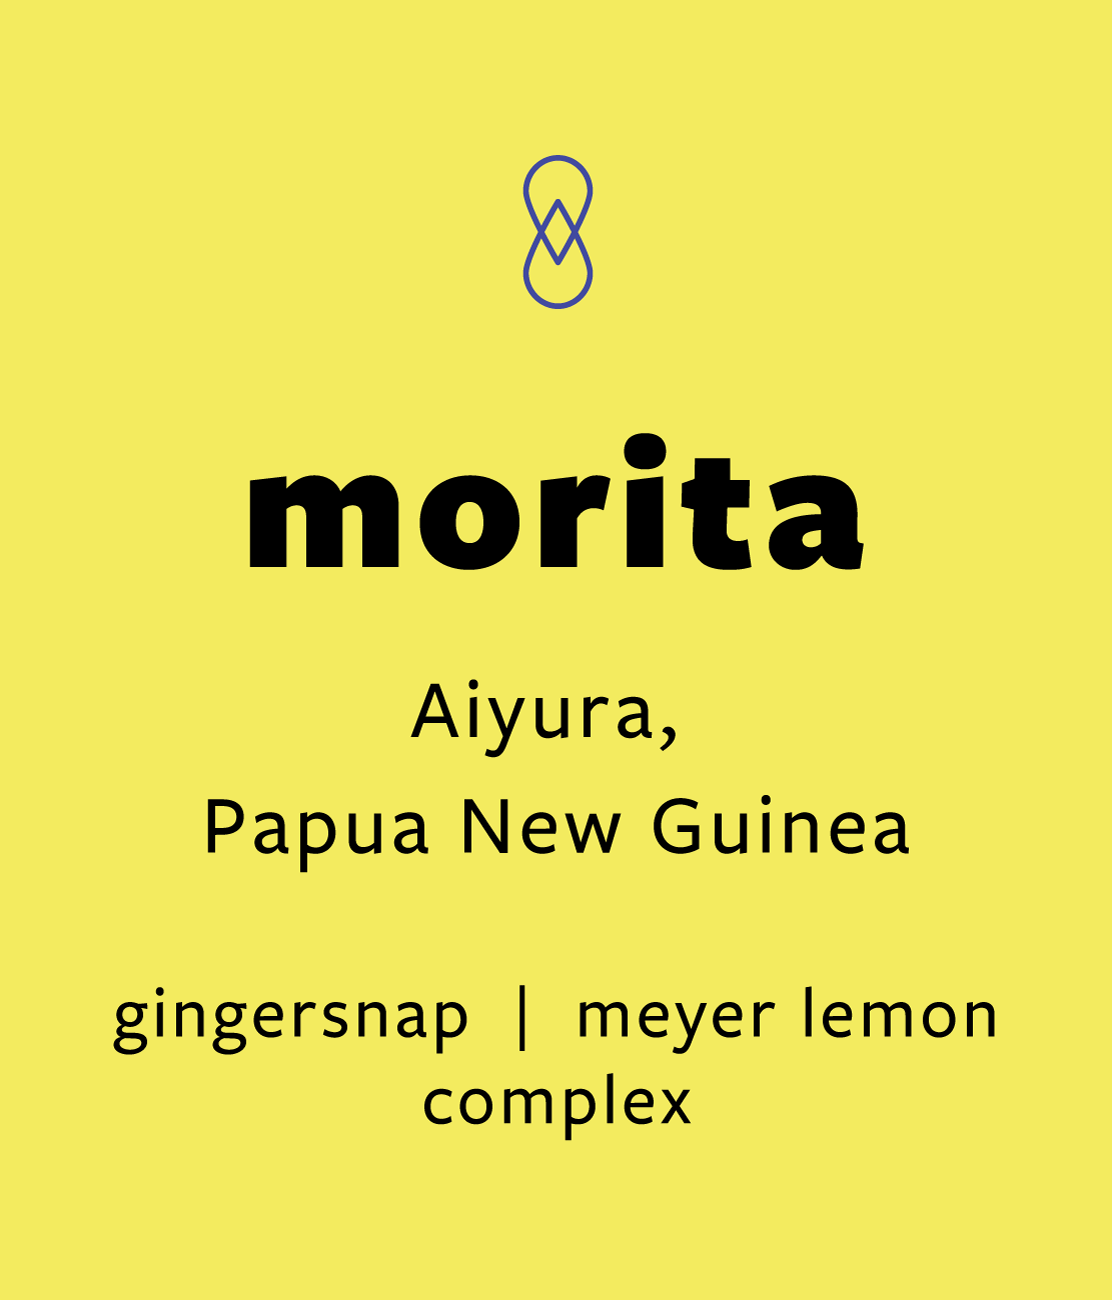 Morita (Aiyura, Eastern Highlands, Papua